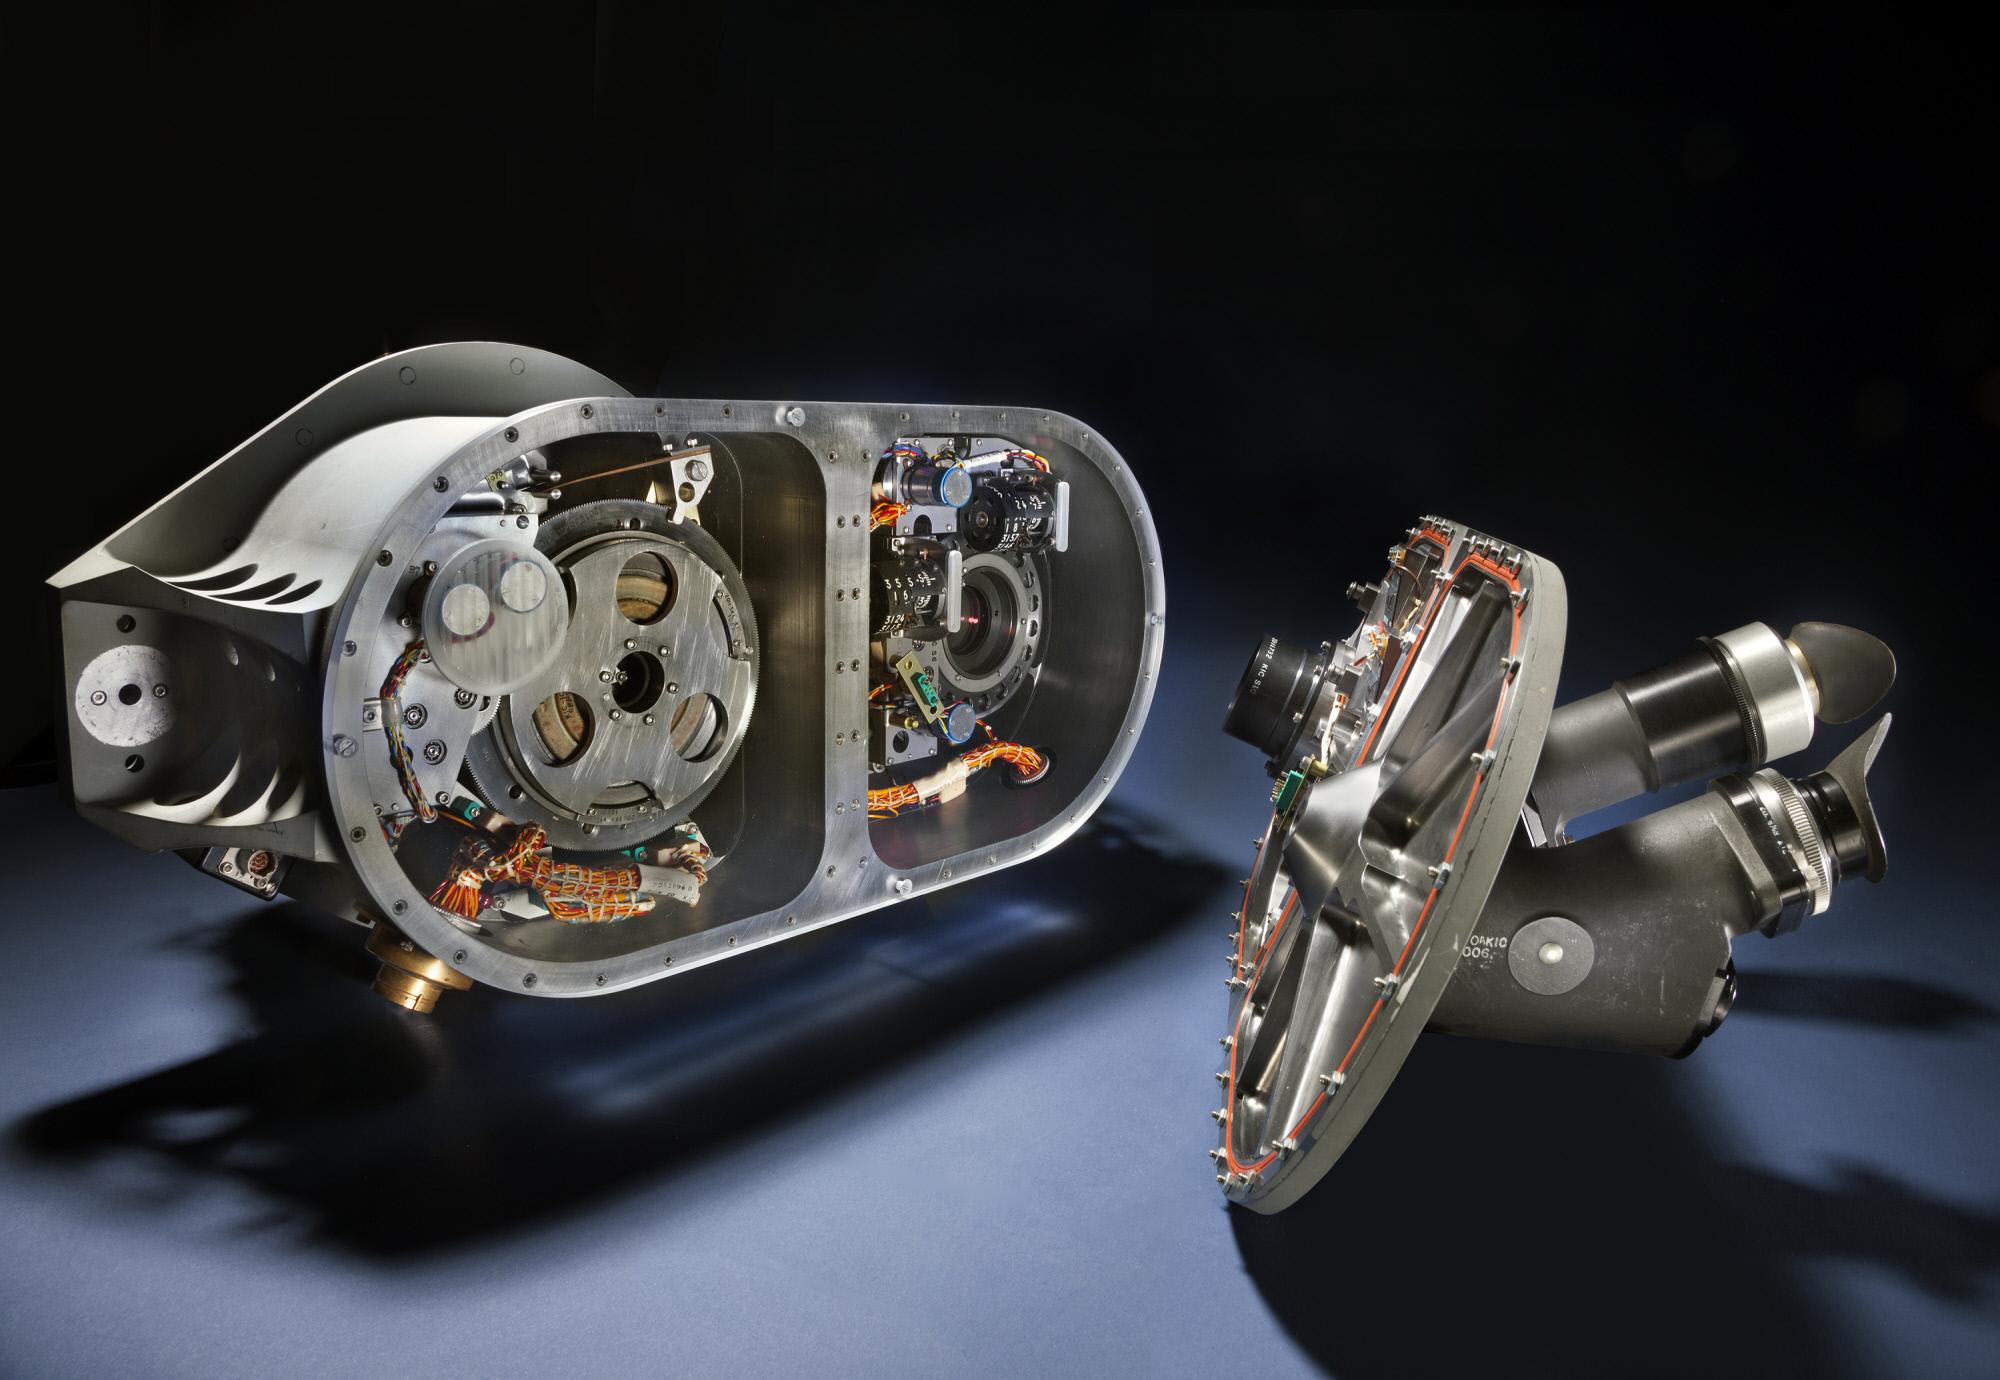 apollo spacecraft guidance system - photo #18